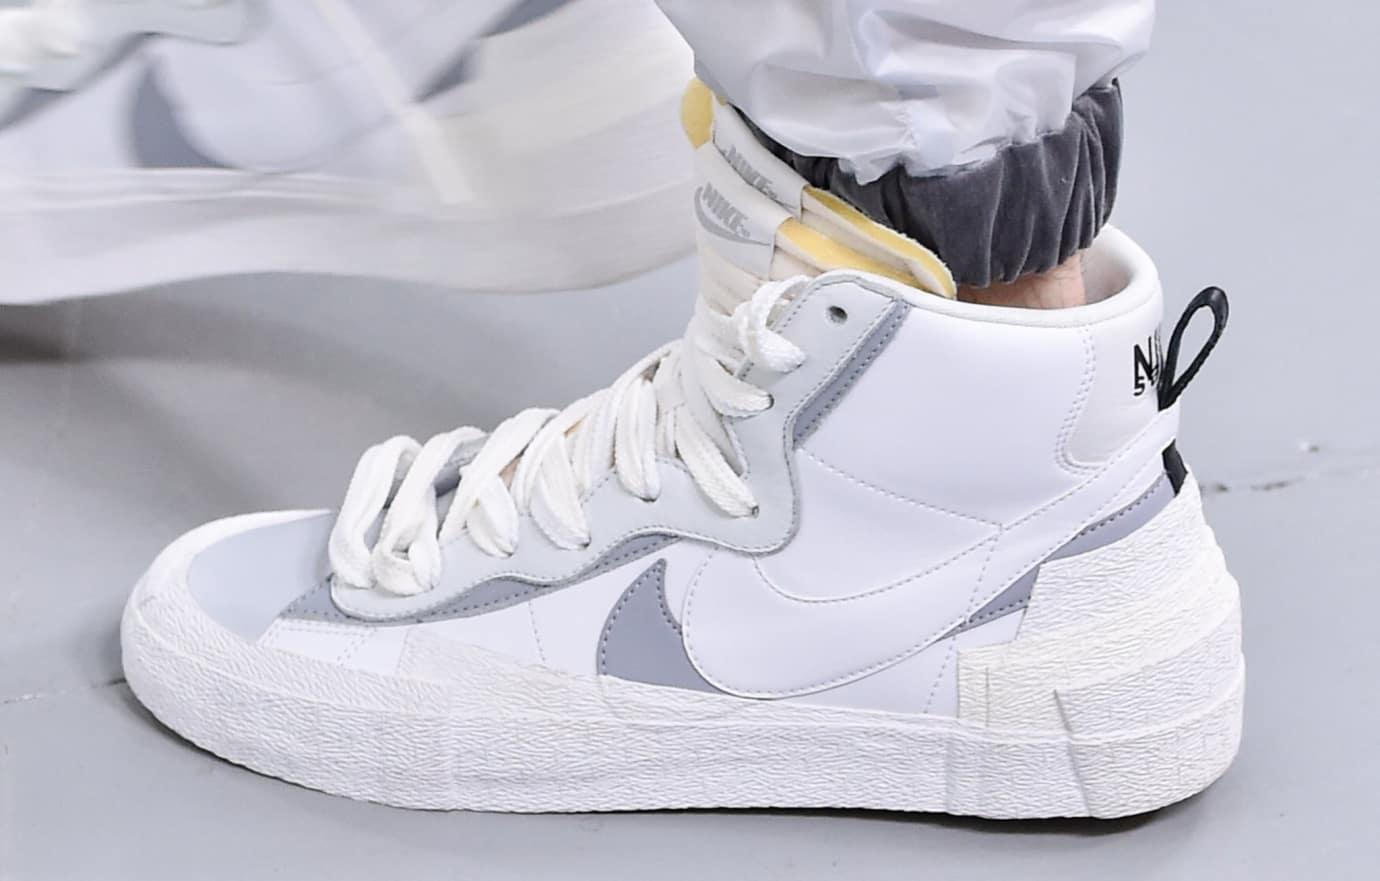 sacai x nike blazer white grey